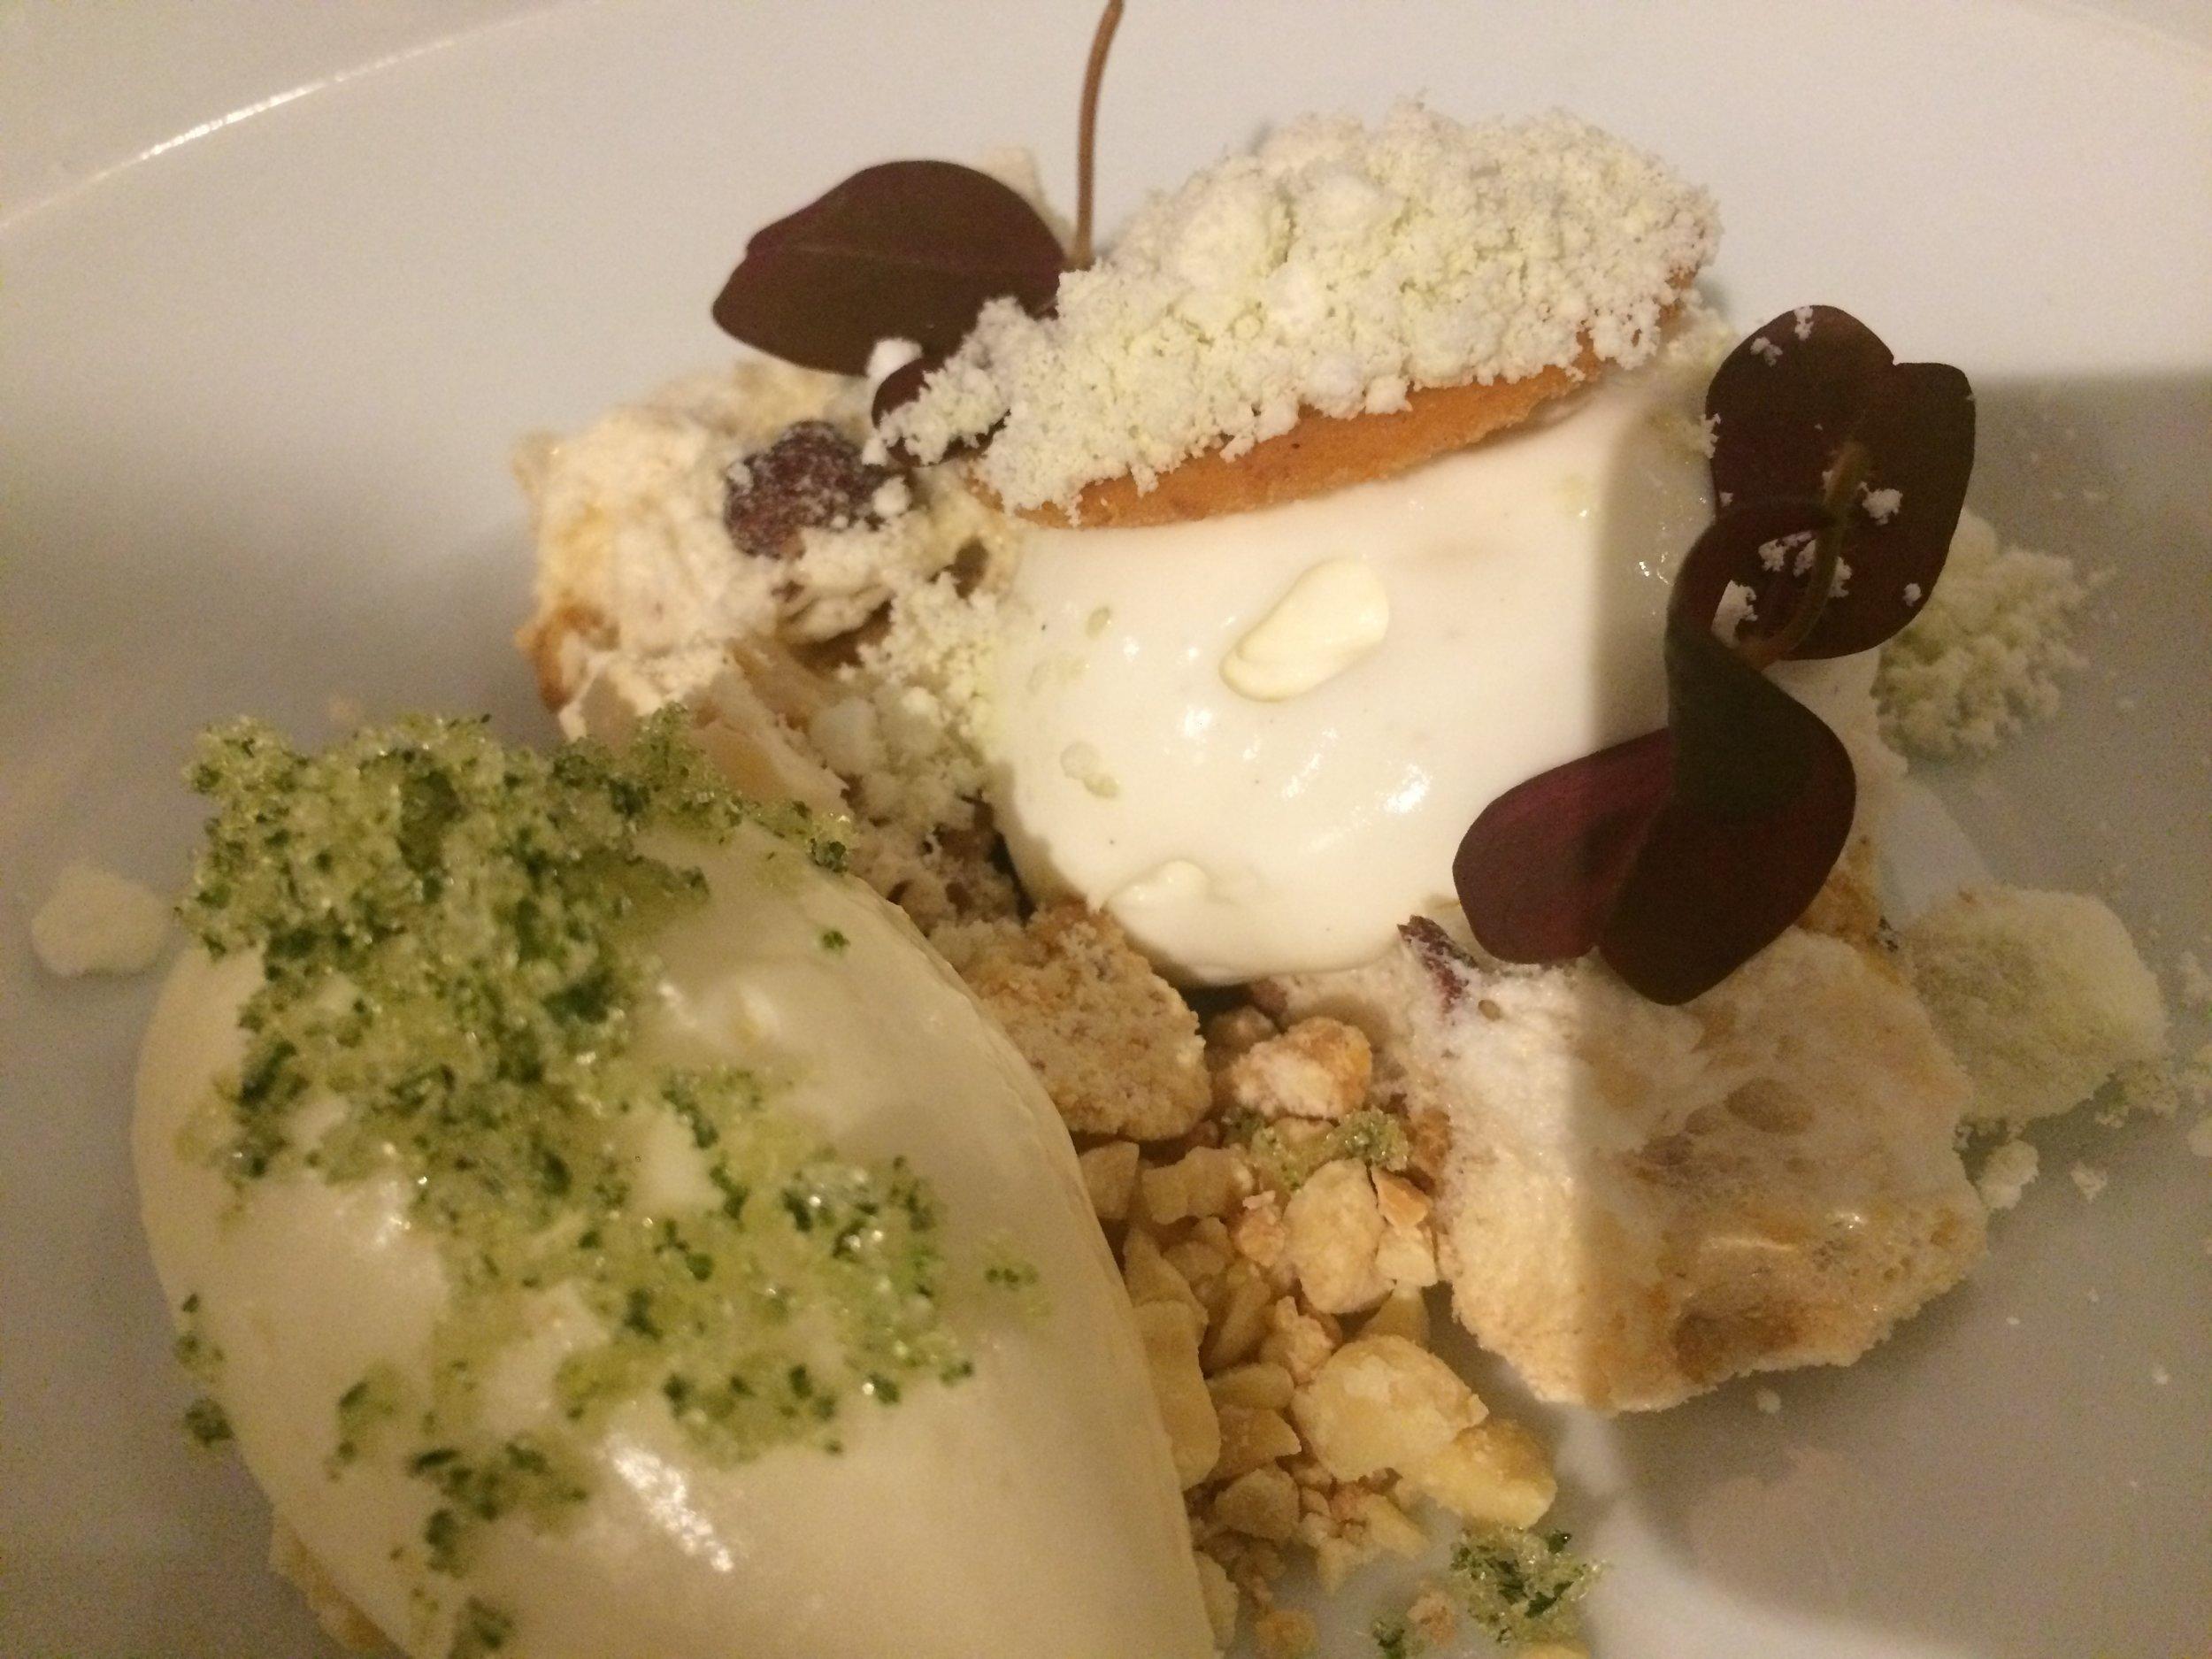 Dessert. Absolutely amazing! velvety, chocolatey and flowery. I'm a big fan!